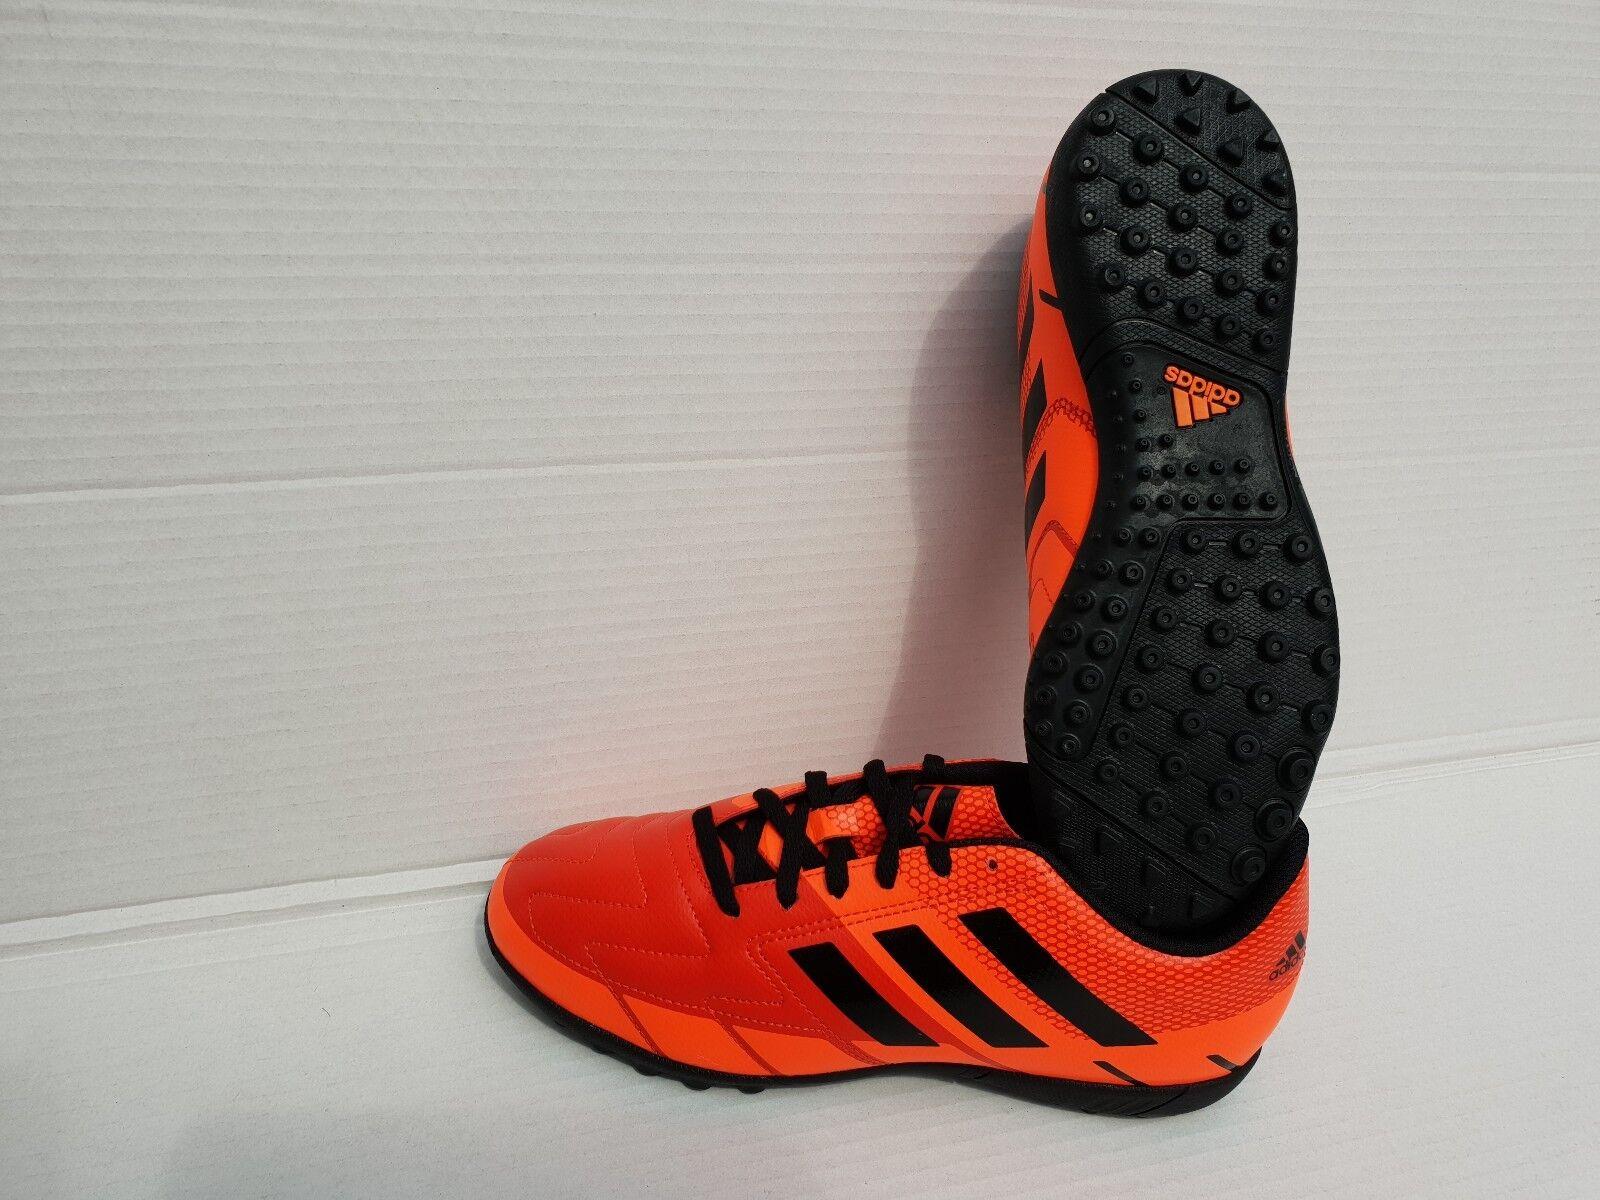 Adidas Kinder Fußballschuhe Kunstrasen 34 35 36 37 38 39 Multi Nocken Neu New